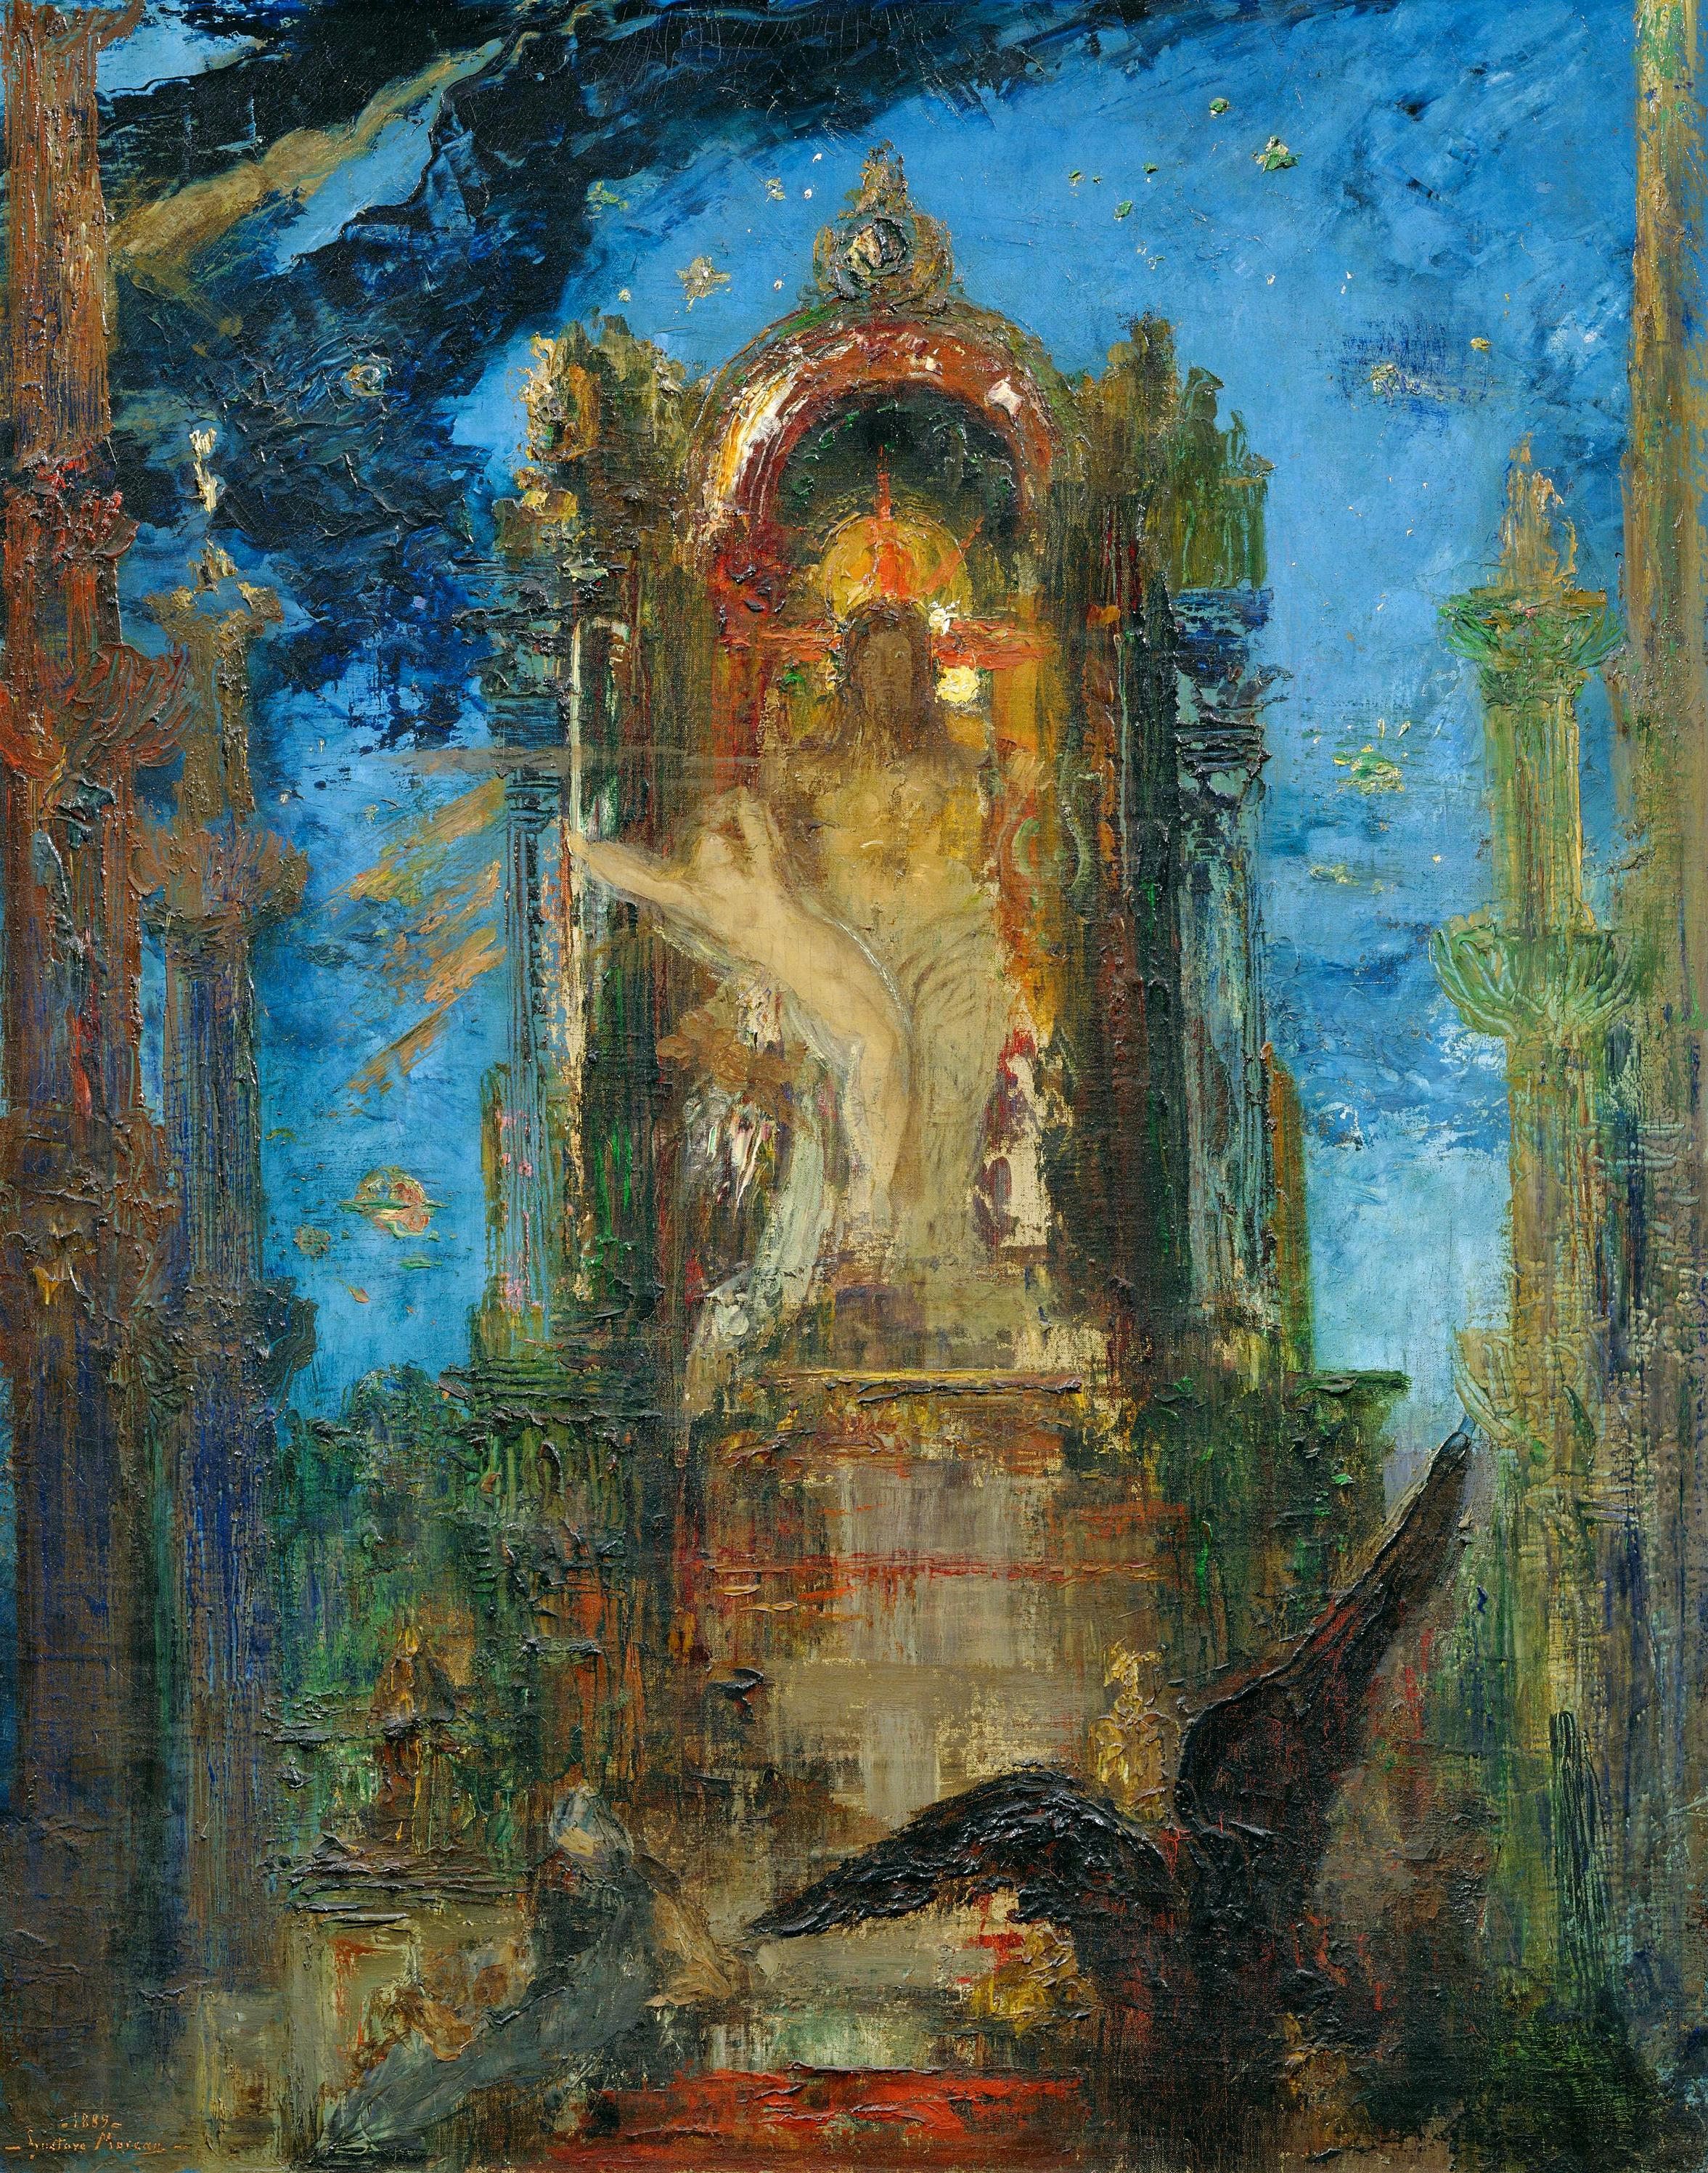 1889 (ок)_Юпитер и Семела (эскиз) (80 х 65 см) (Париж, музей Моро)